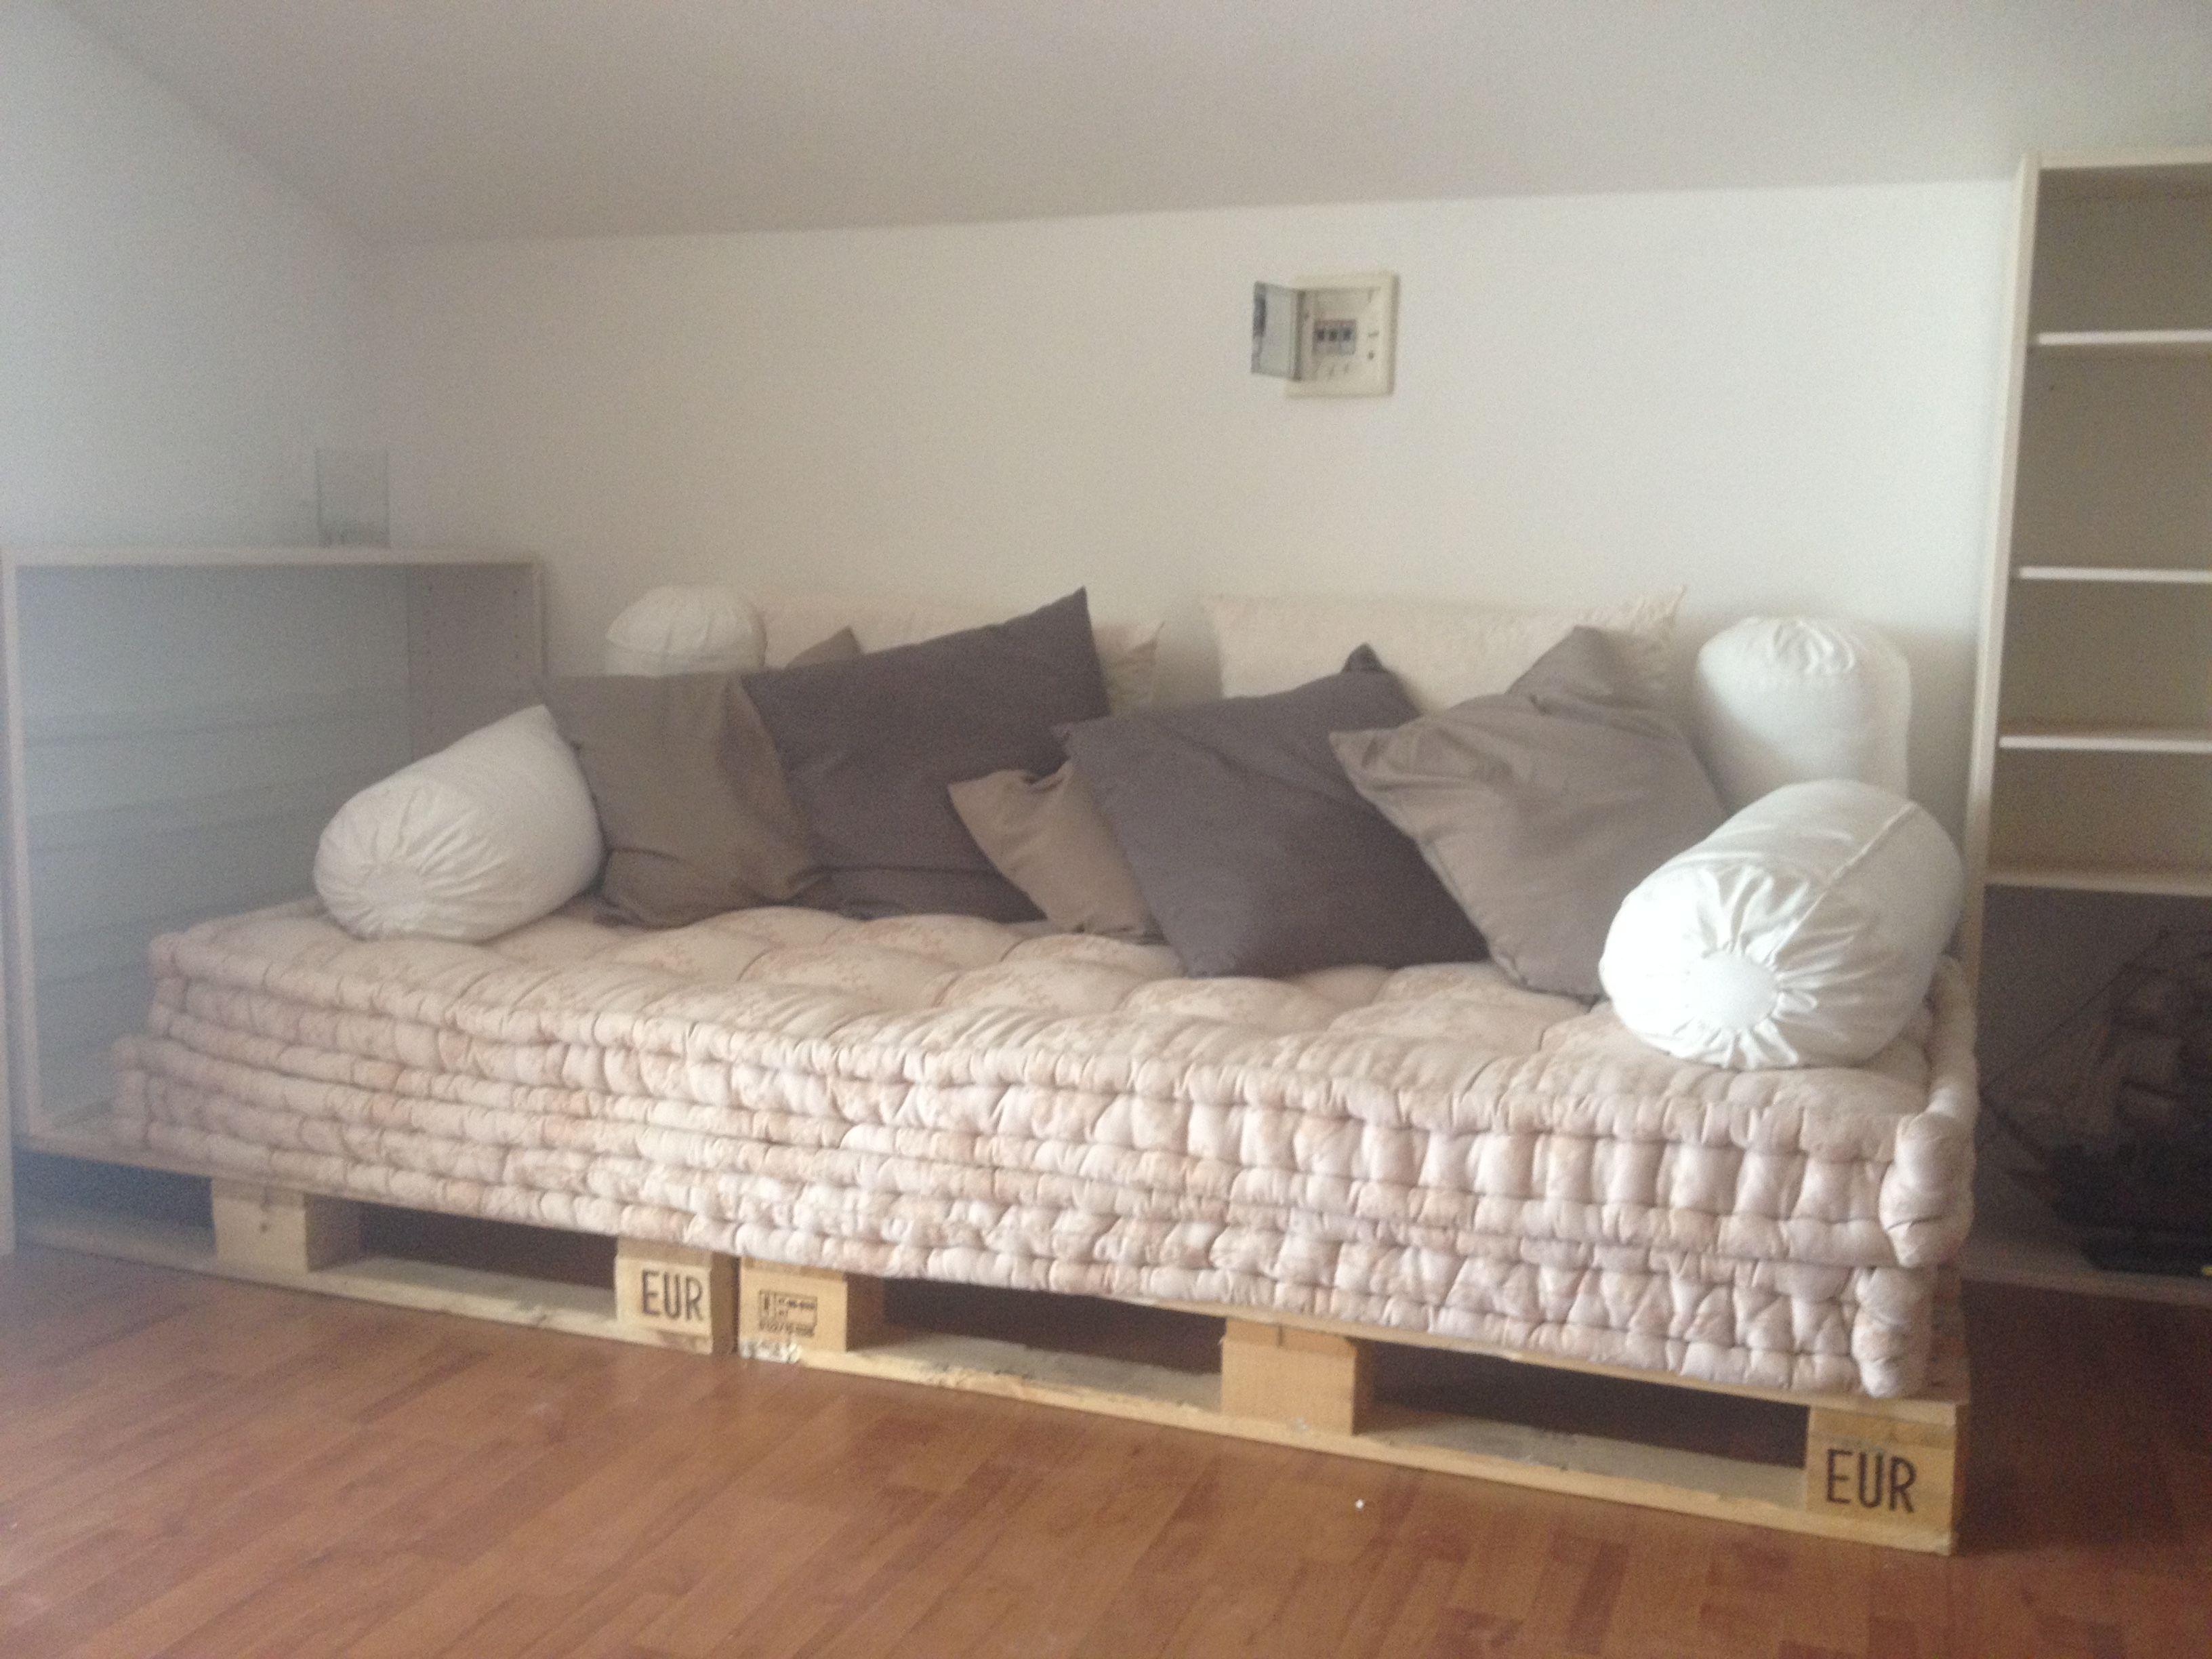 Divano con bancali materassi di lana e cuscini ikea - Imbottitura cuscini divano ikea ...